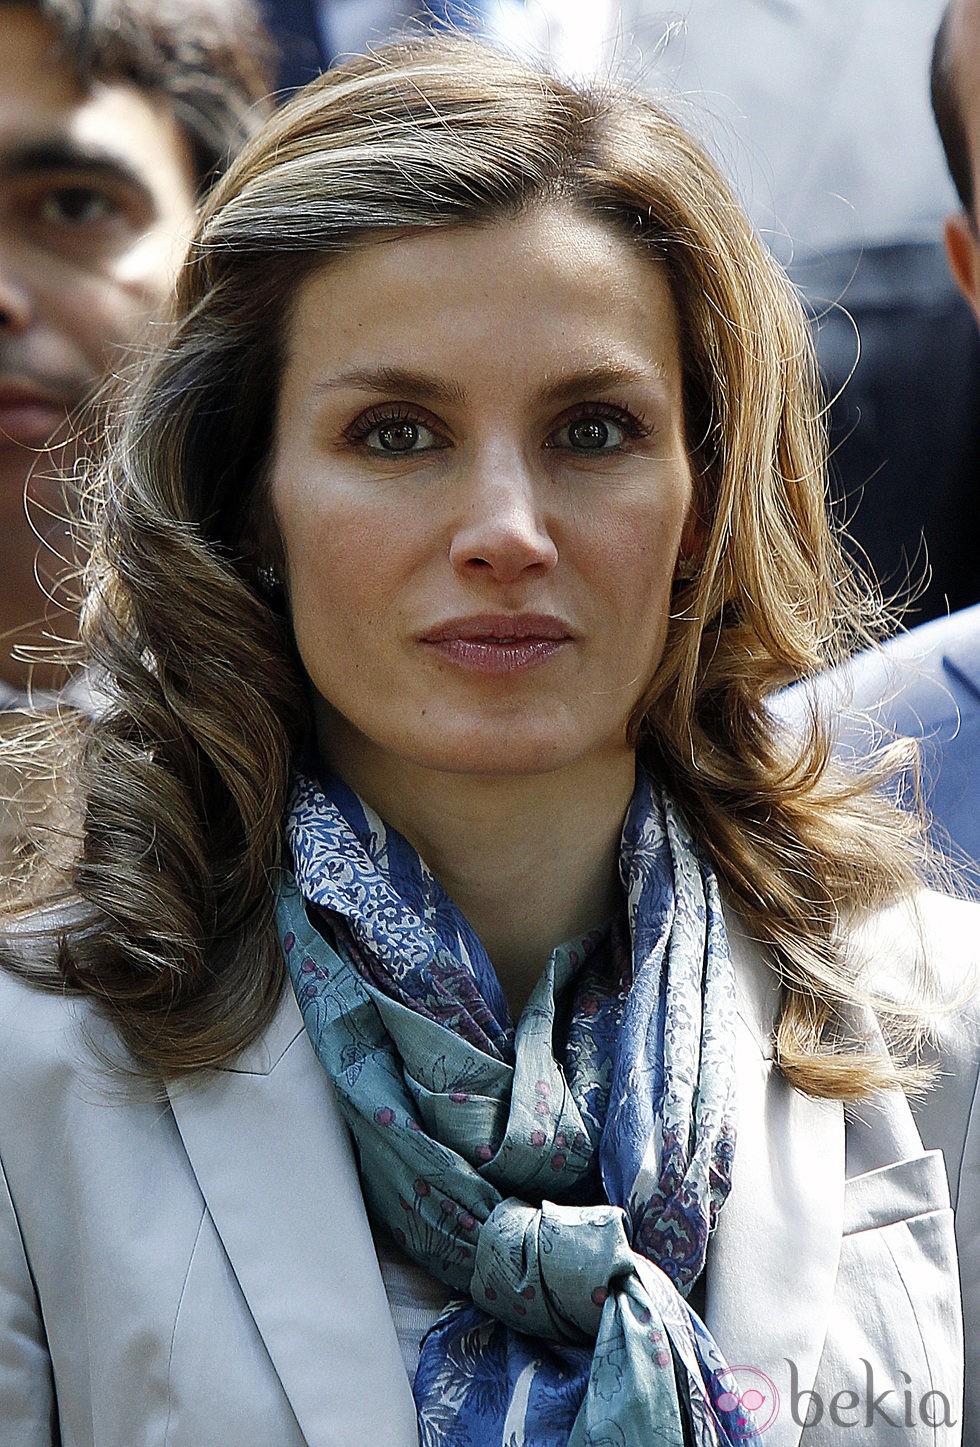 La princesa Letizia con melena ondulada